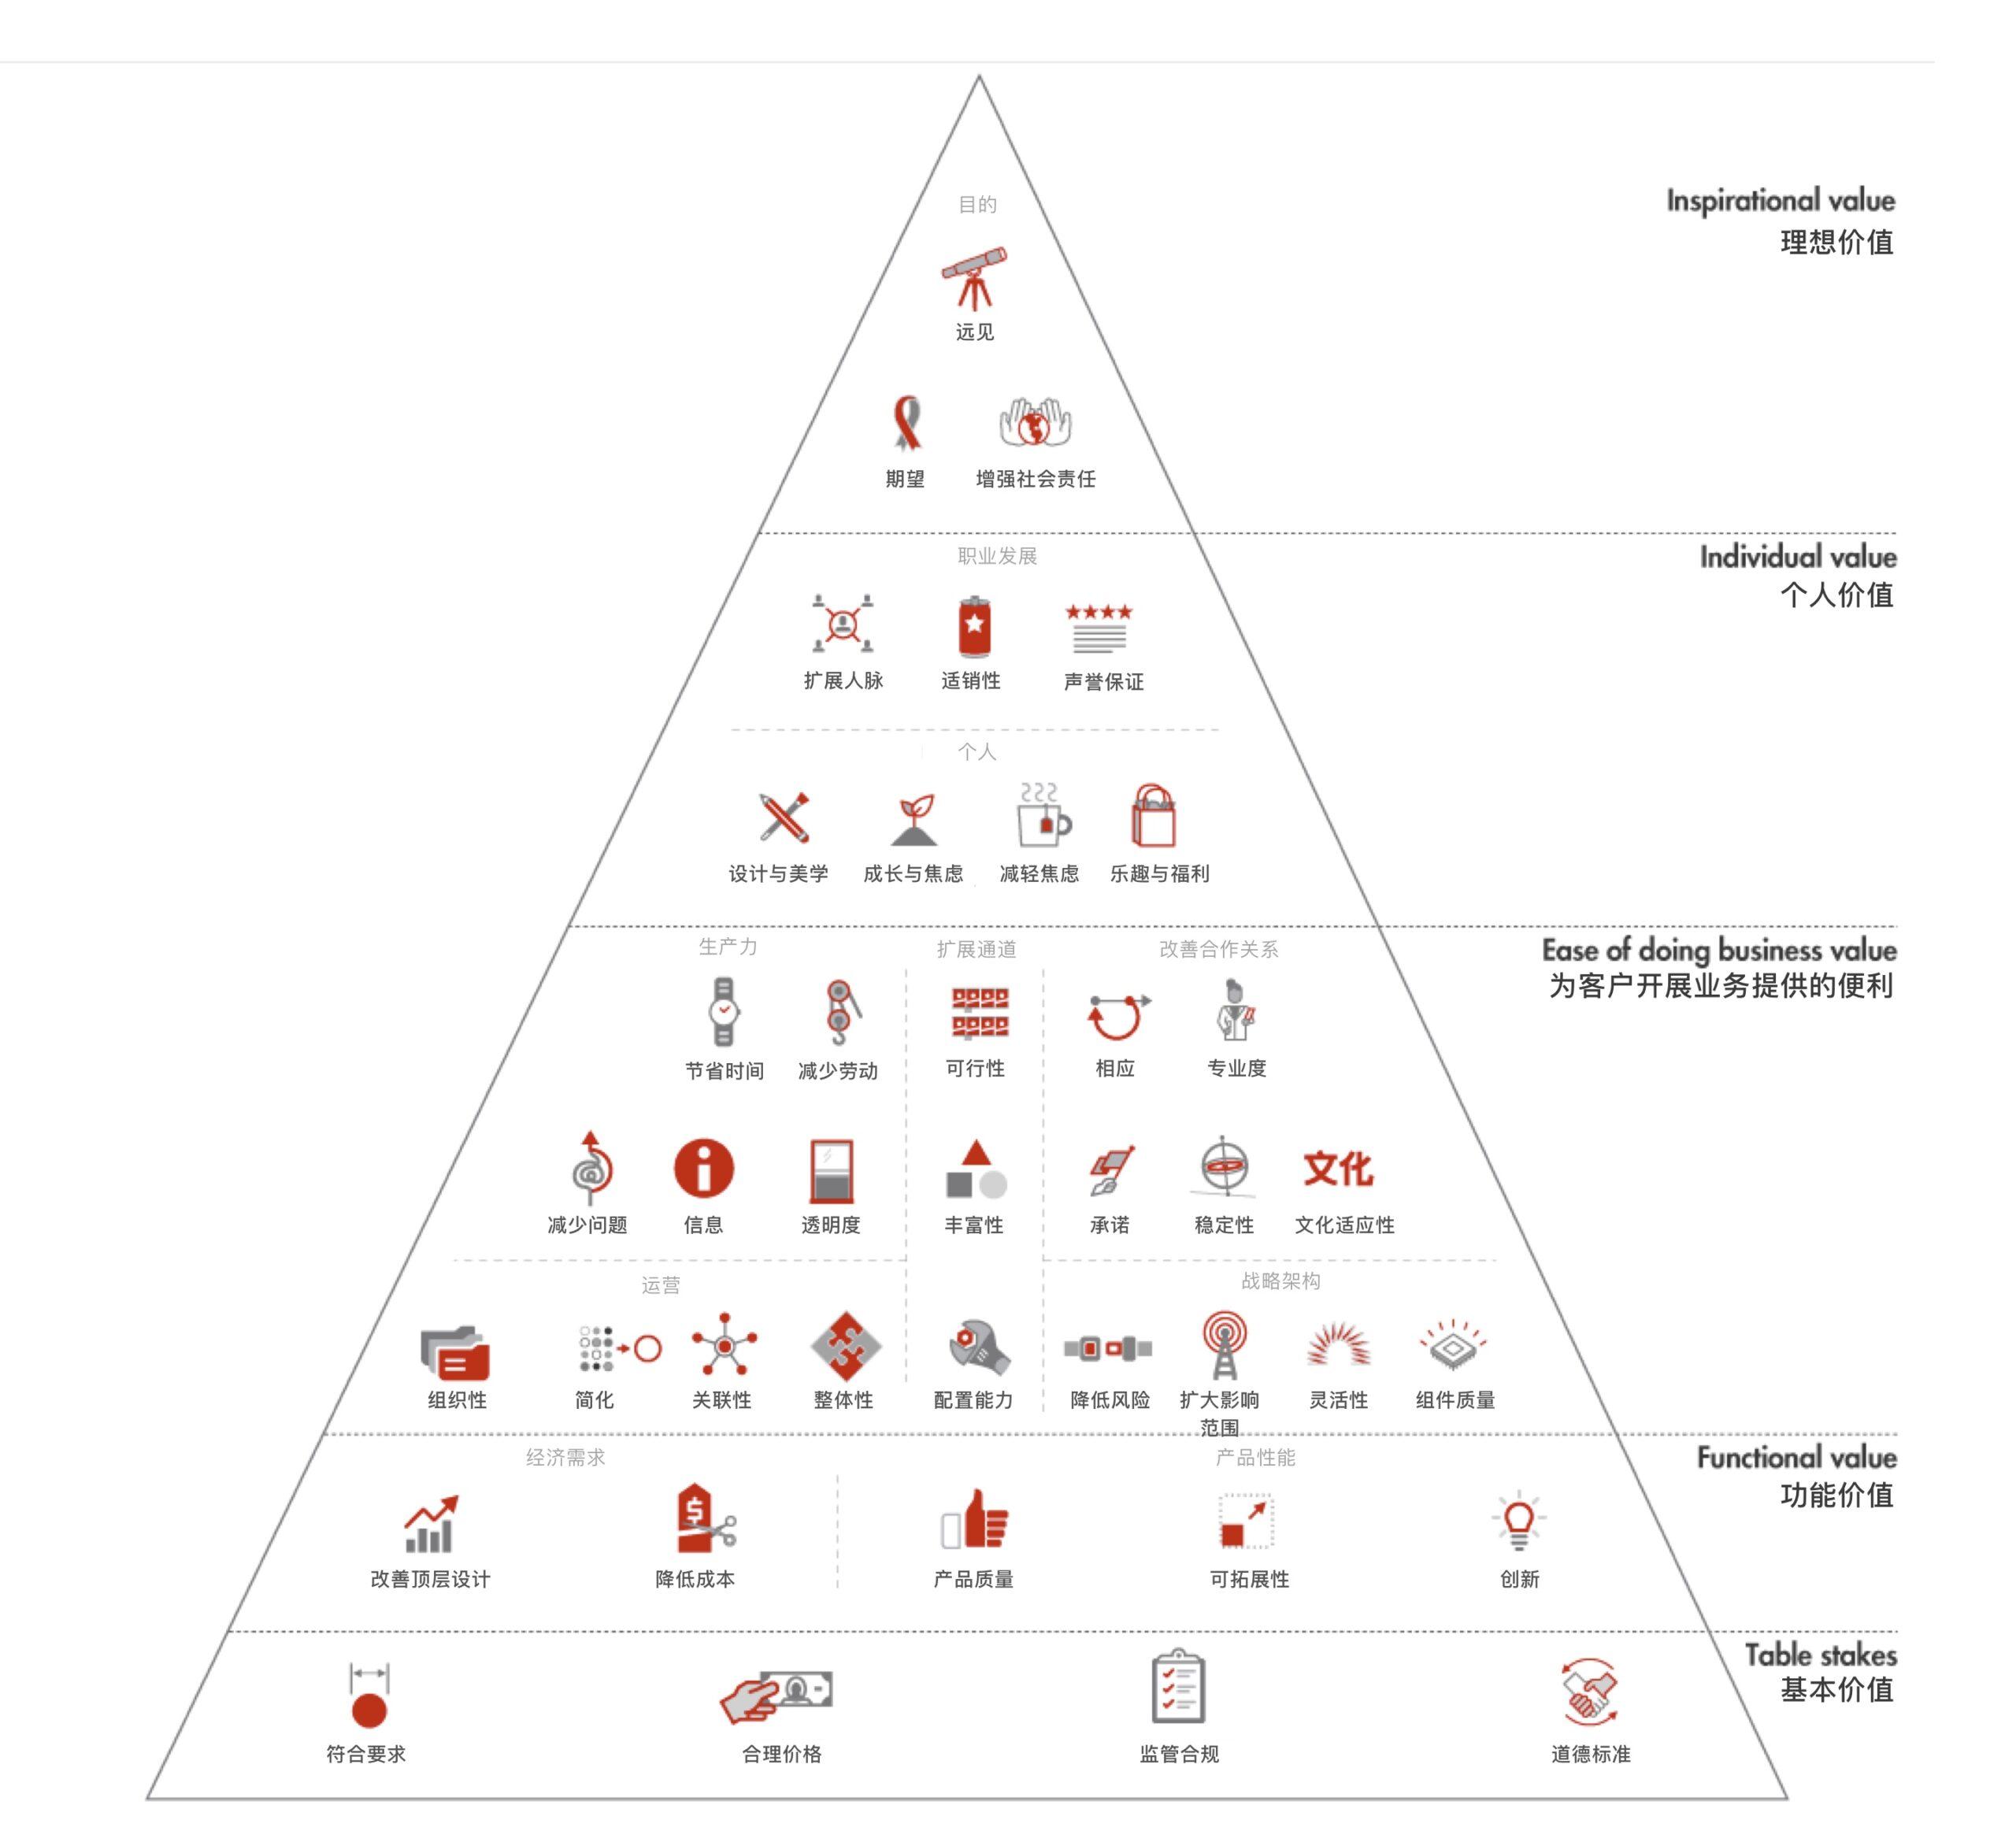 B2B value pyramid